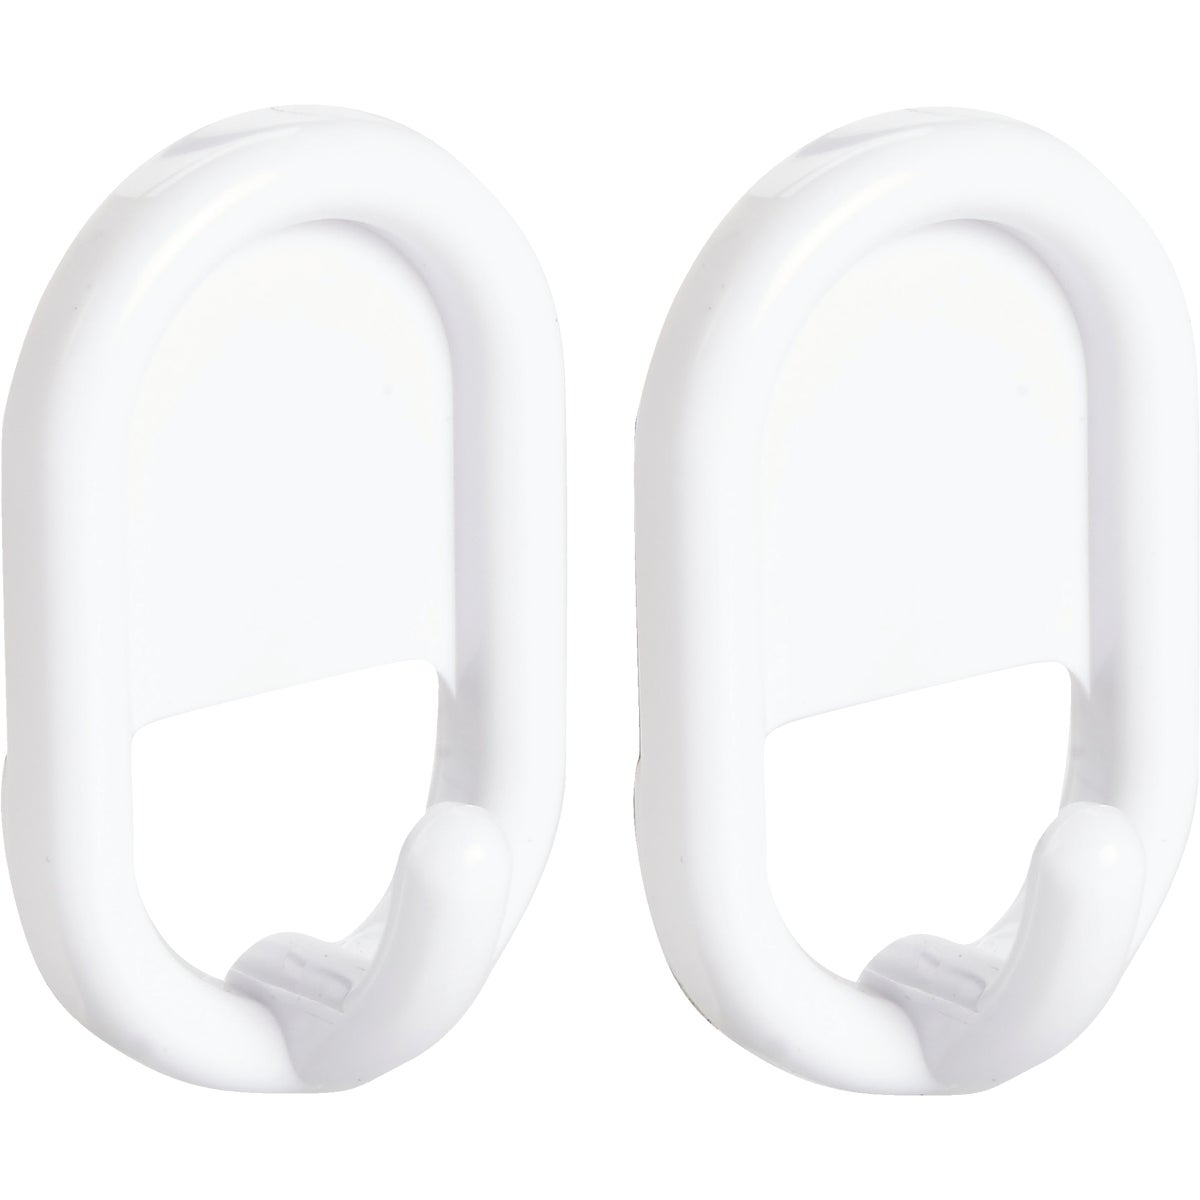 WHITE ADHESIVE HOOK - 14201 by Interdesign Inc